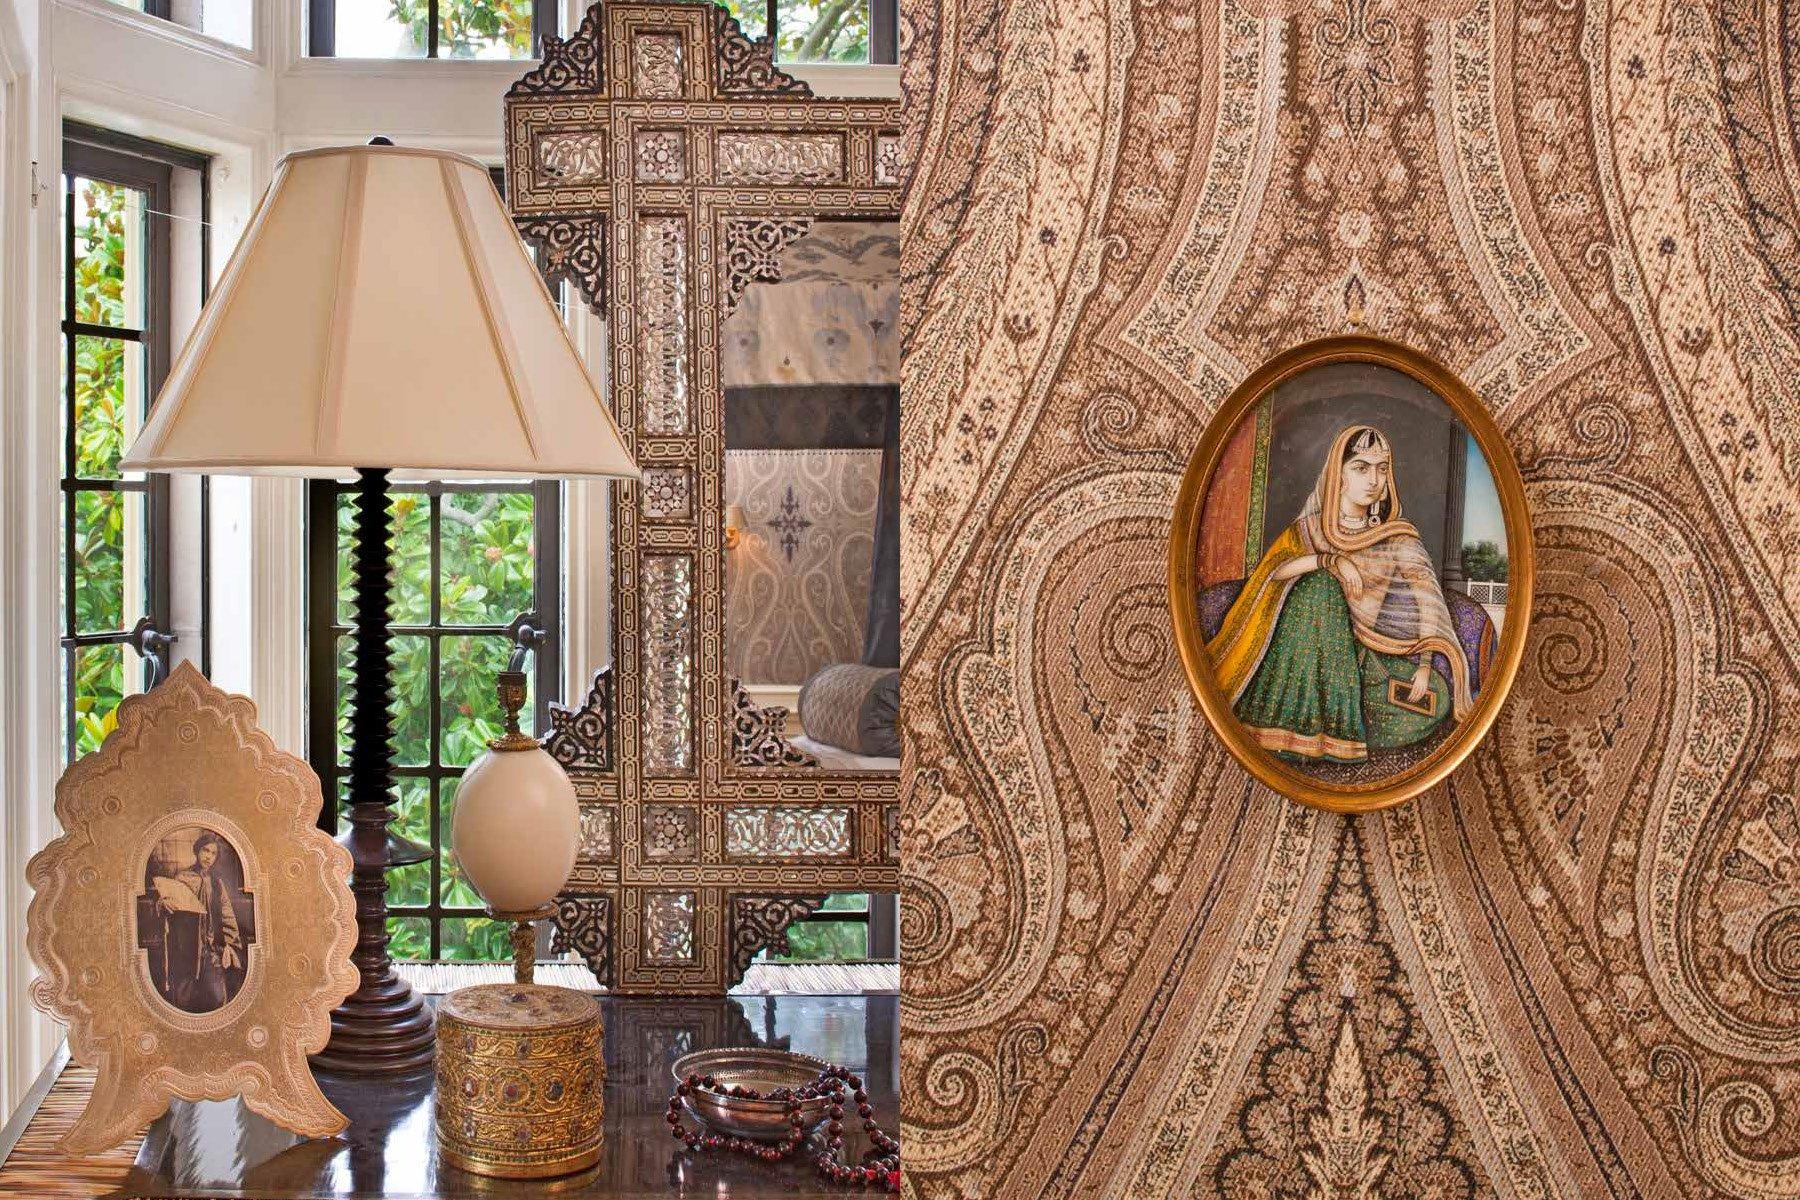 Home Decor, Wall Decor, Furnishings, Distinctive Gifts